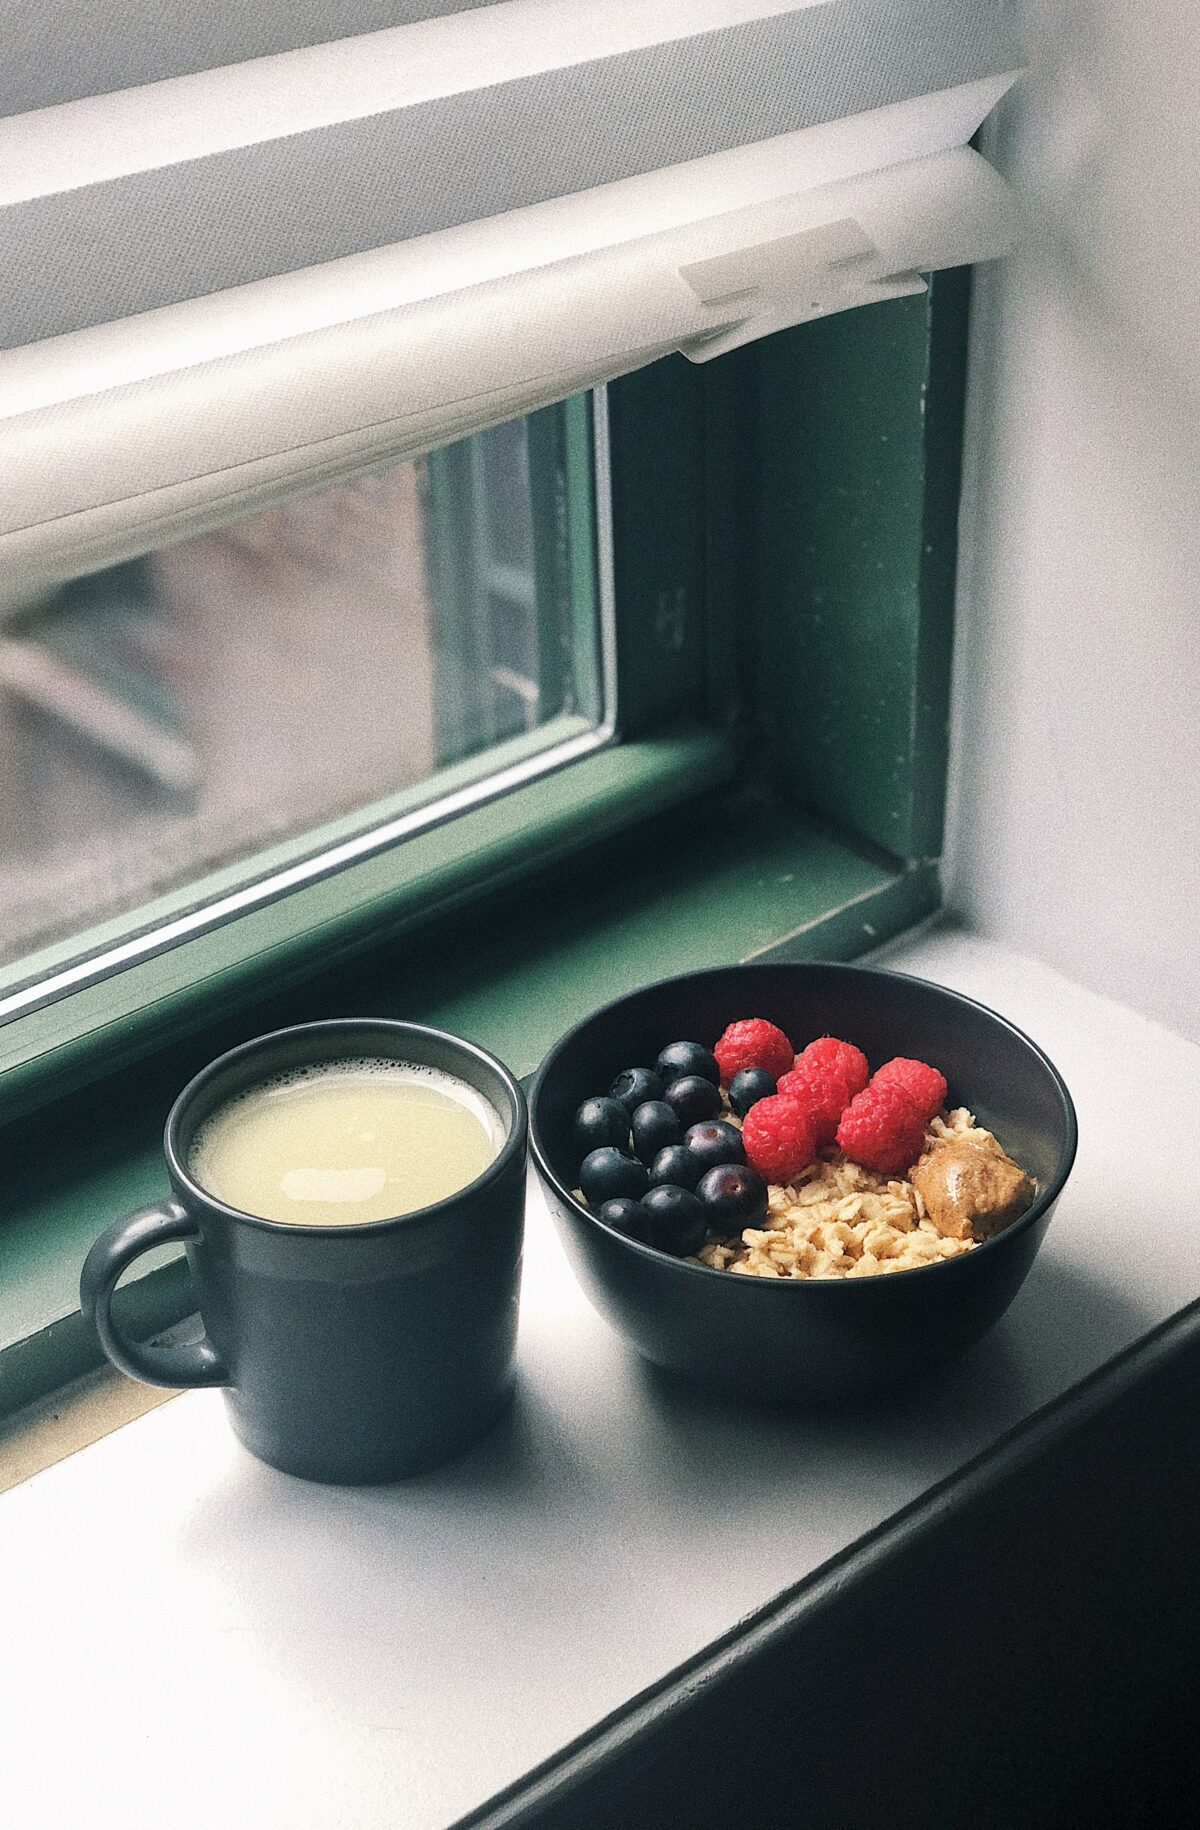 black ceramic mug with white liquid inside